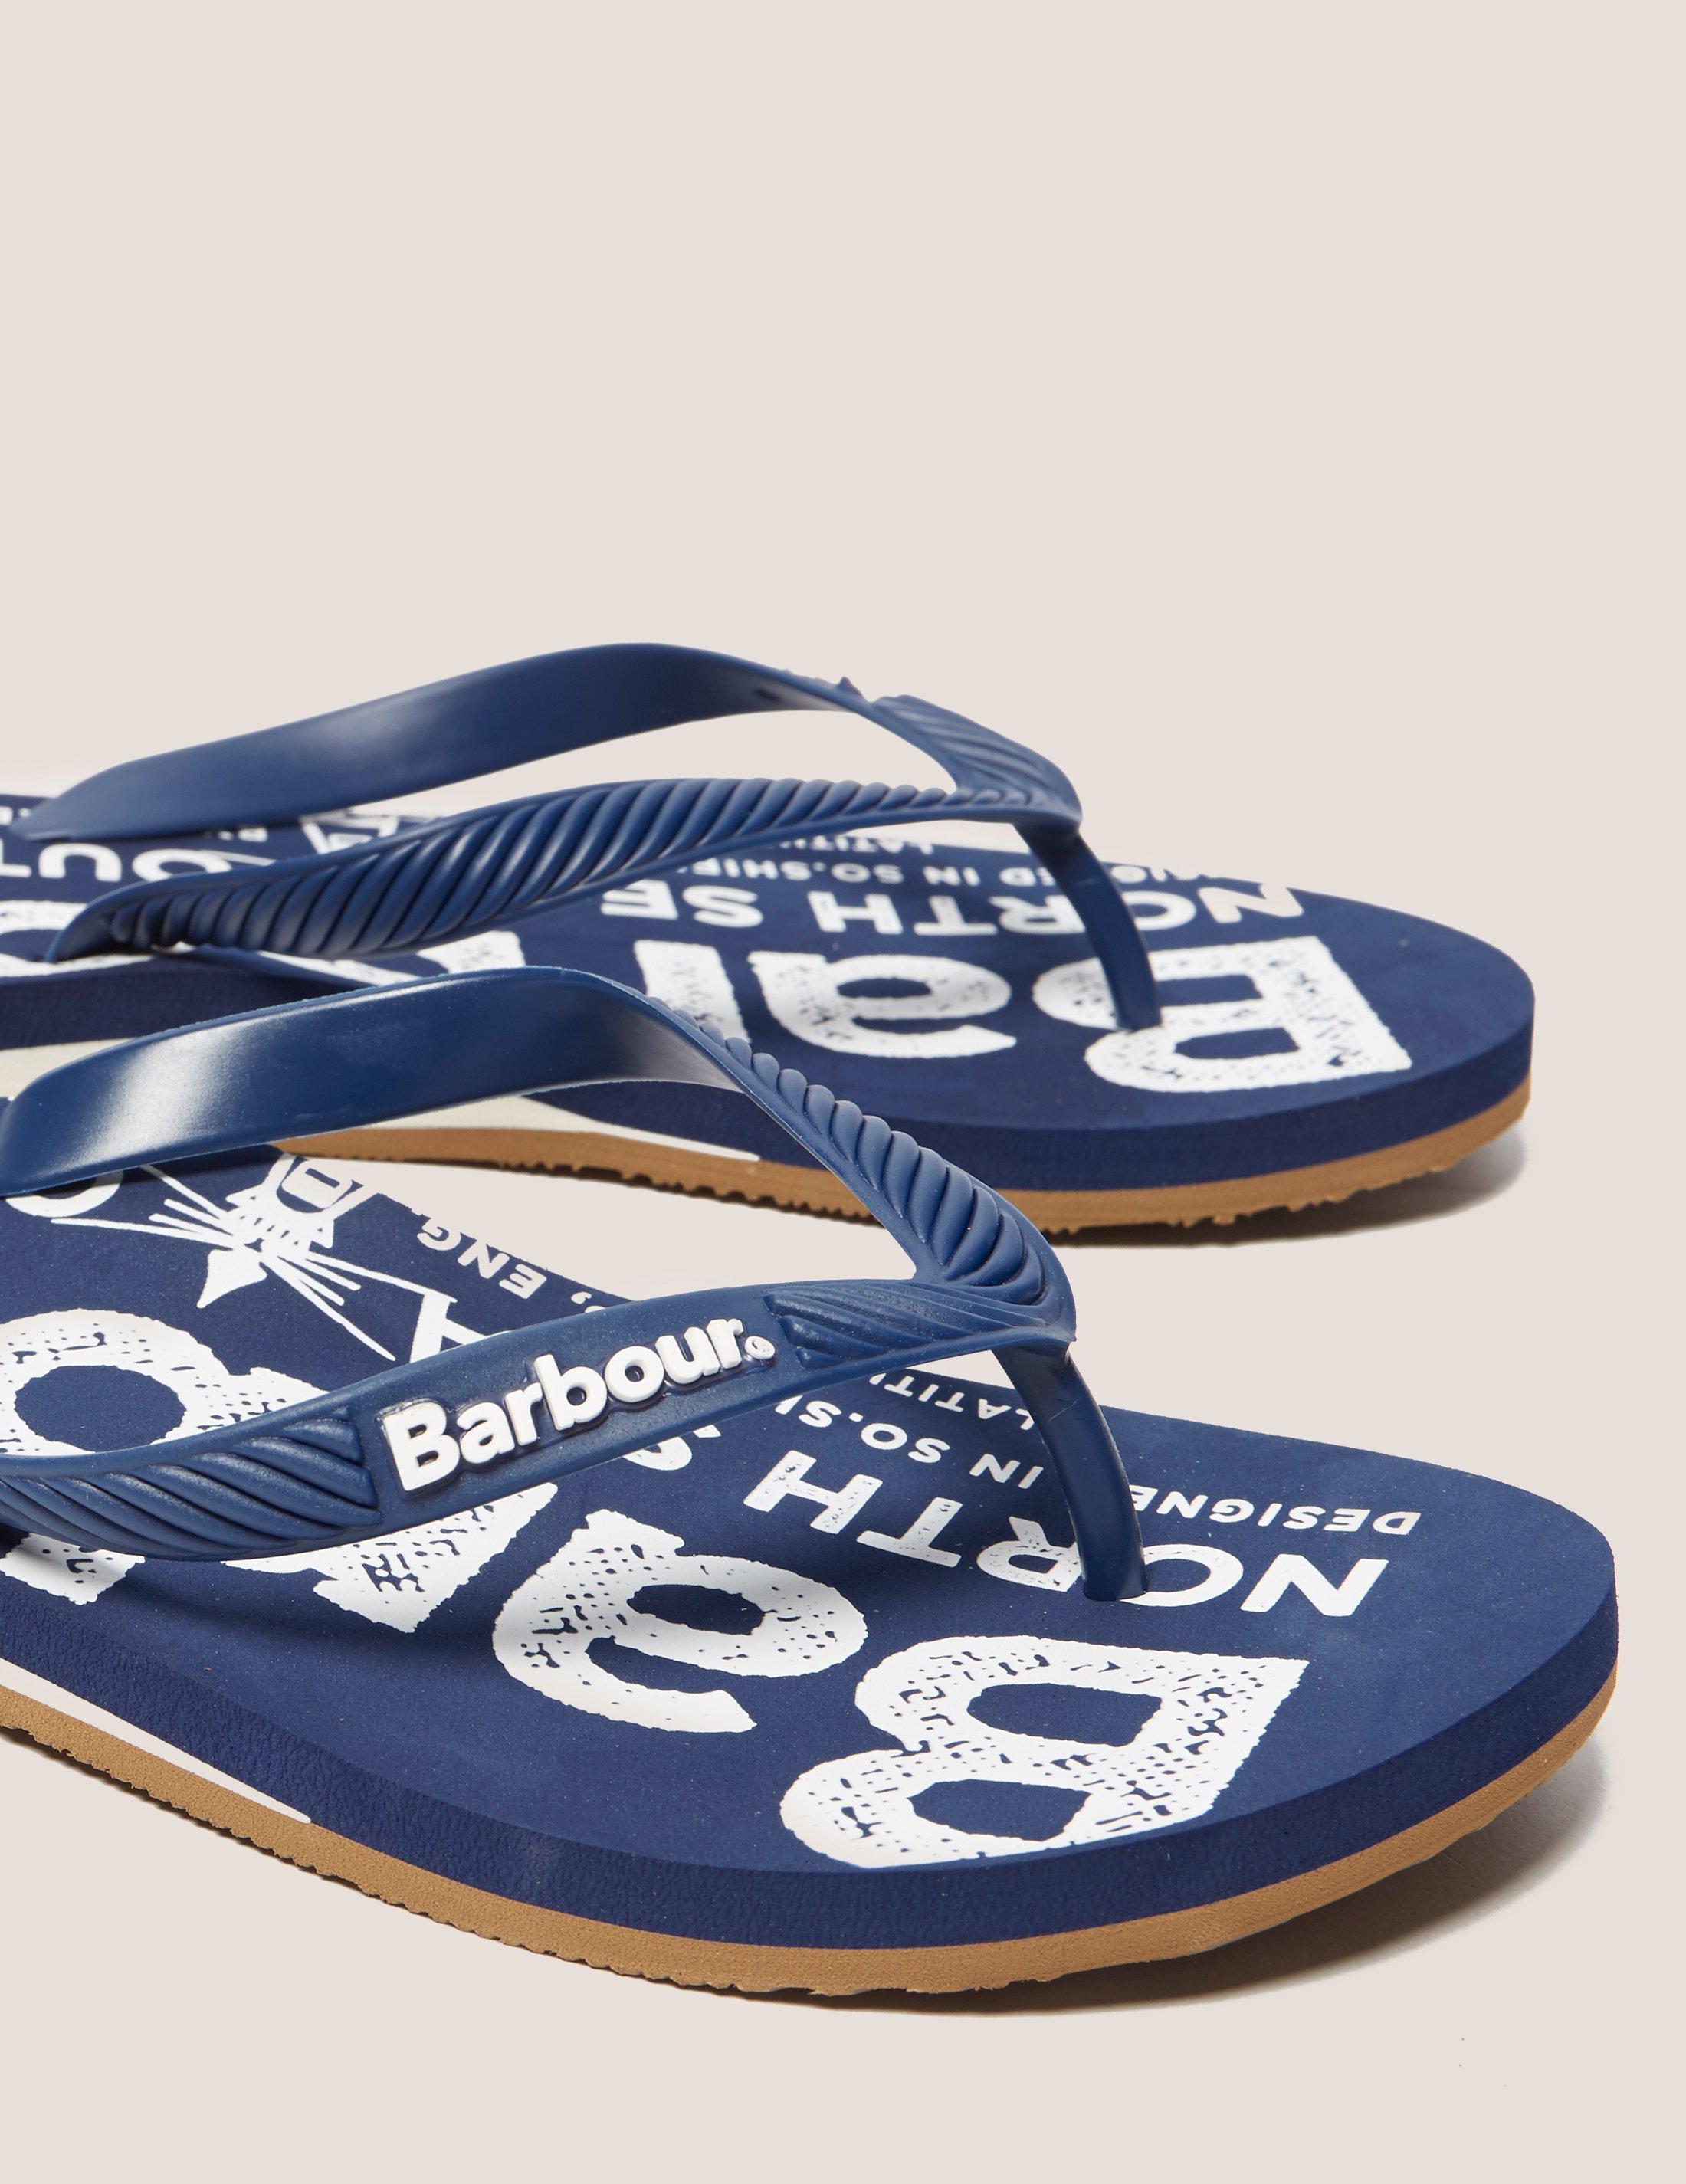 332f8186b0d1 Lyst - Barbour North Sea Beach Flip Flops in Blue for Men